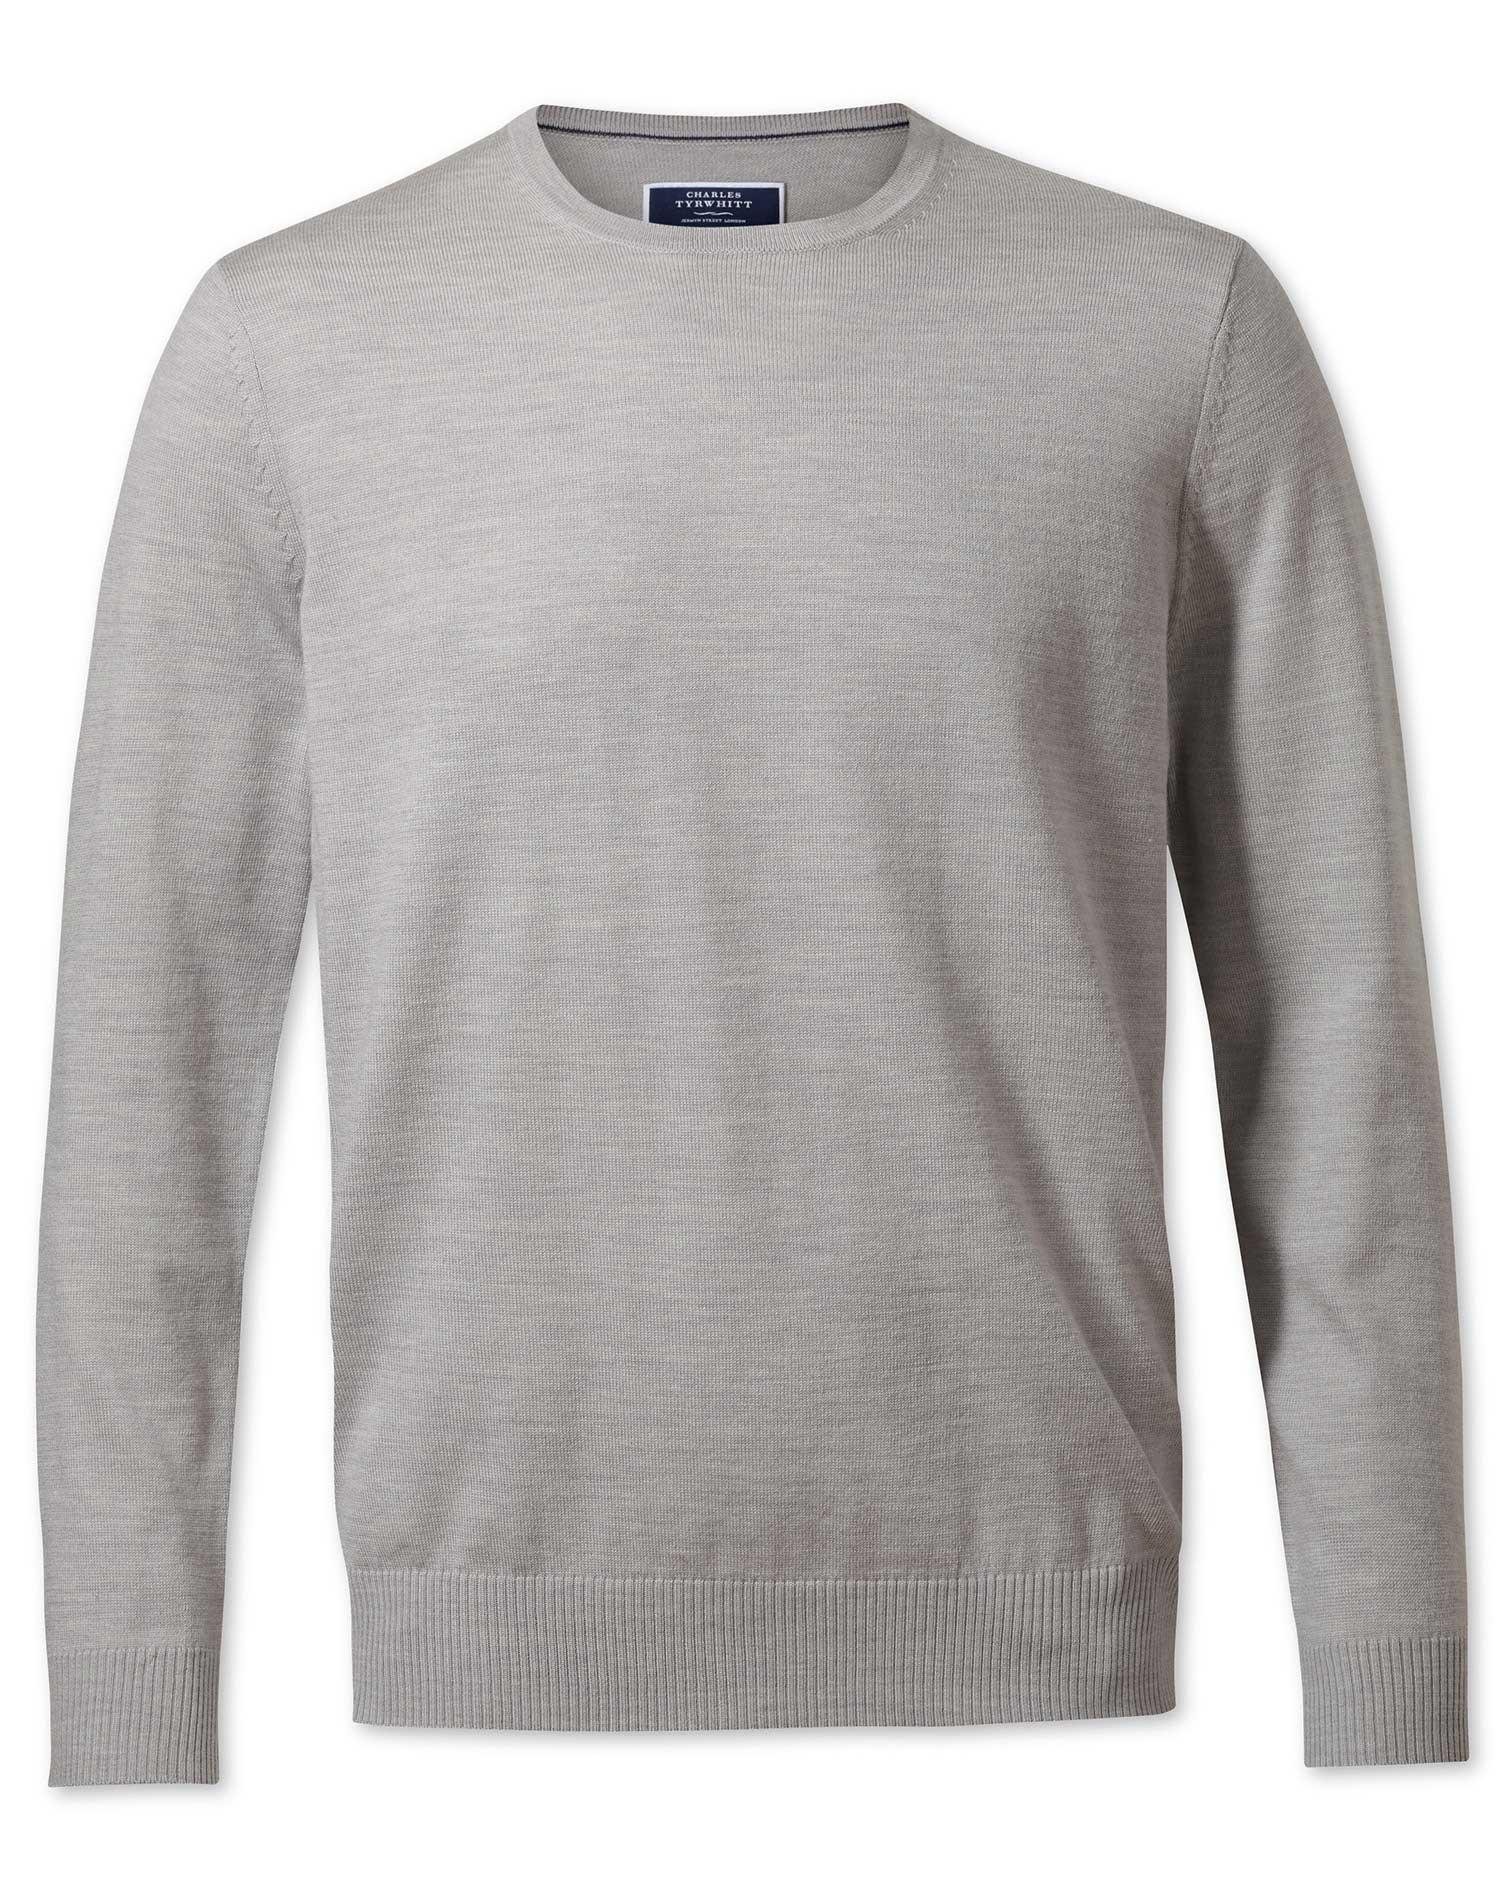 Silver Merino Wool Crew Neck Jumper Size XXL by Charles Tyrwhitt